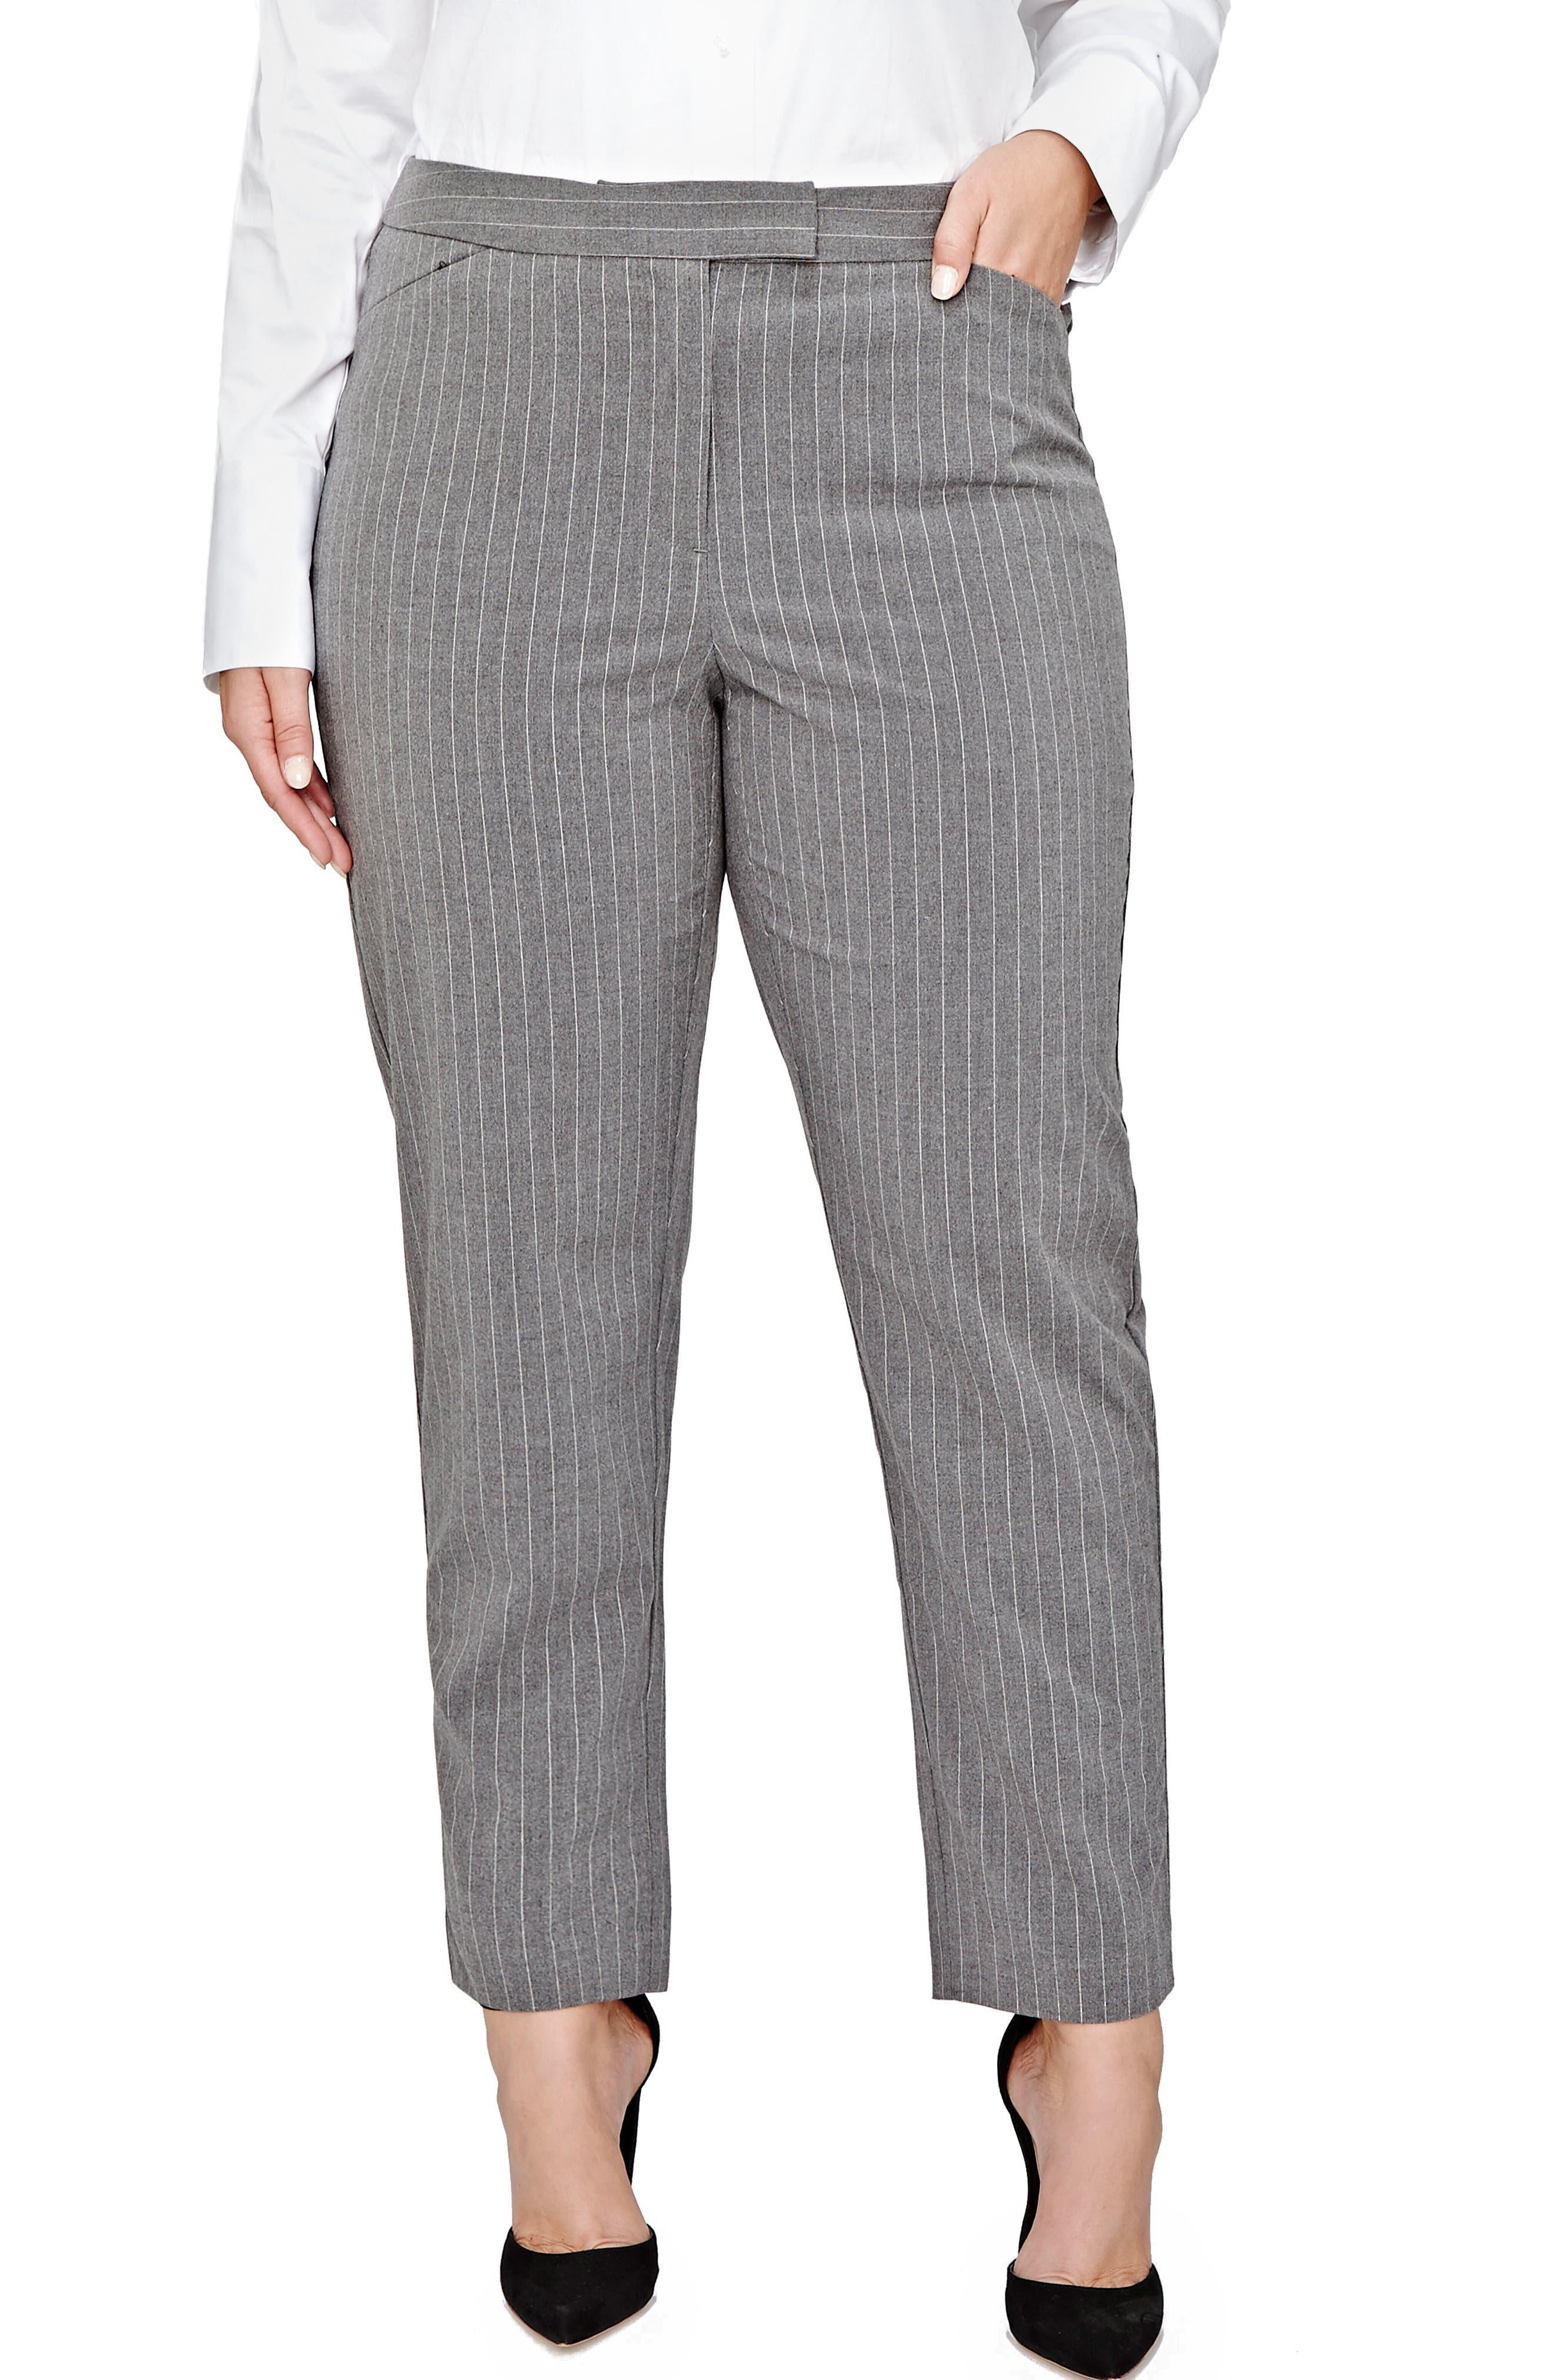 Pinstripe Cigarette Pants,                             Main thumbnail 1, color,                             Medium Grey Mix Combo